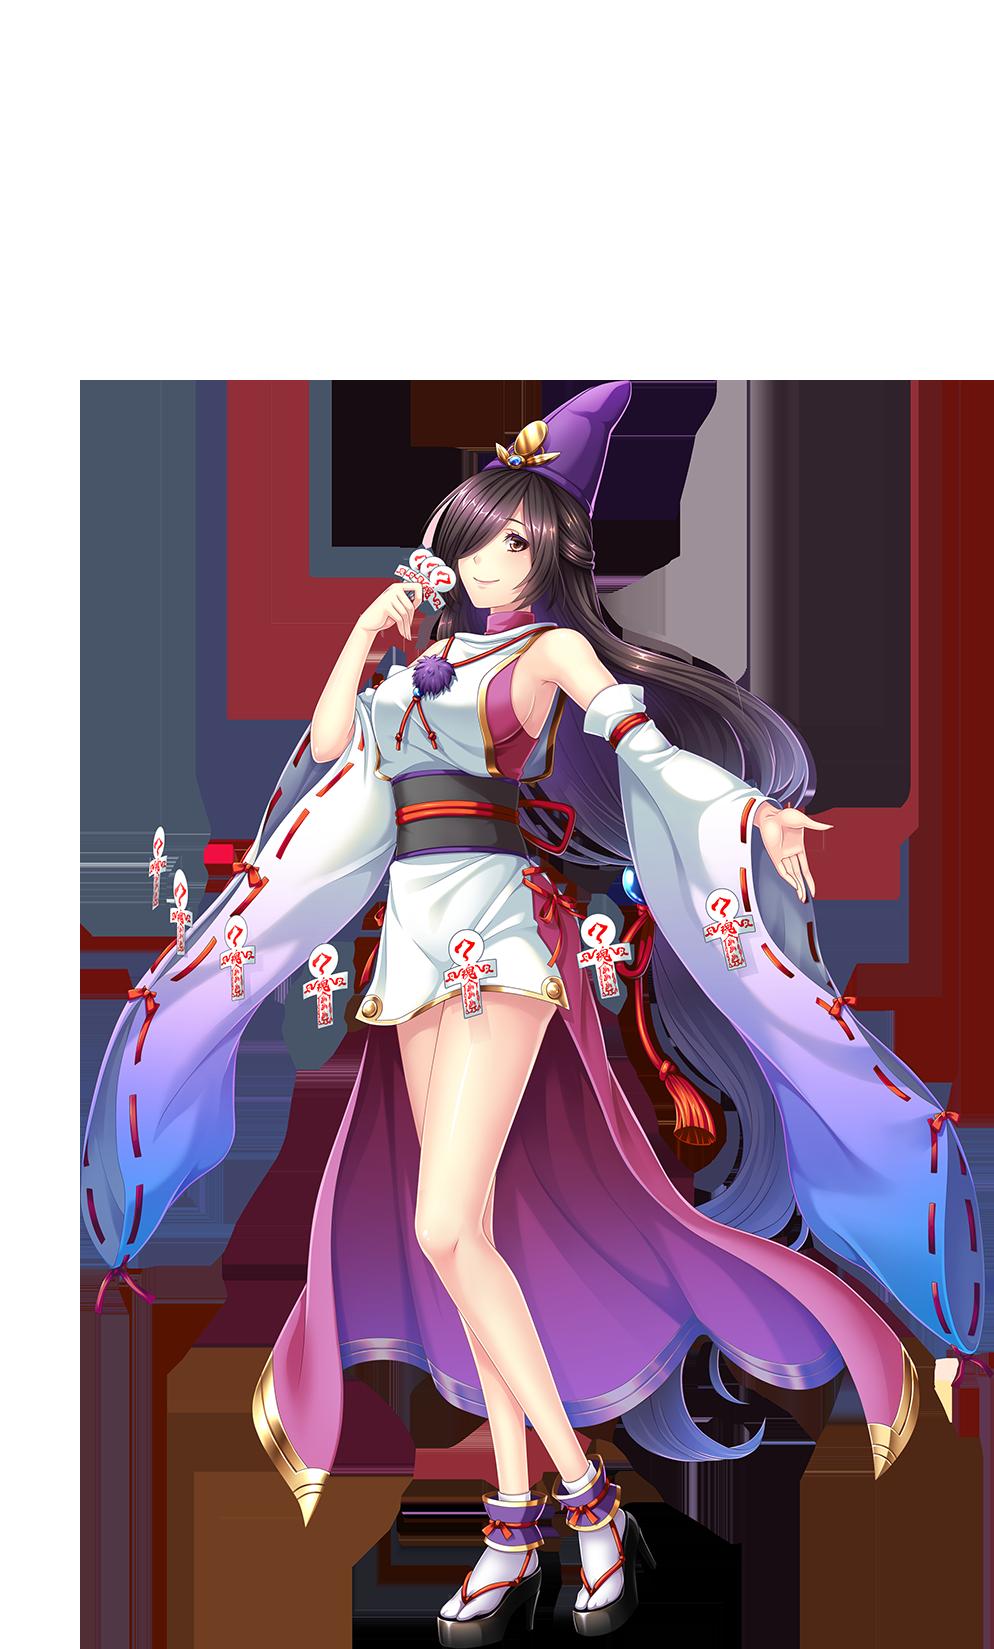 Koyomi